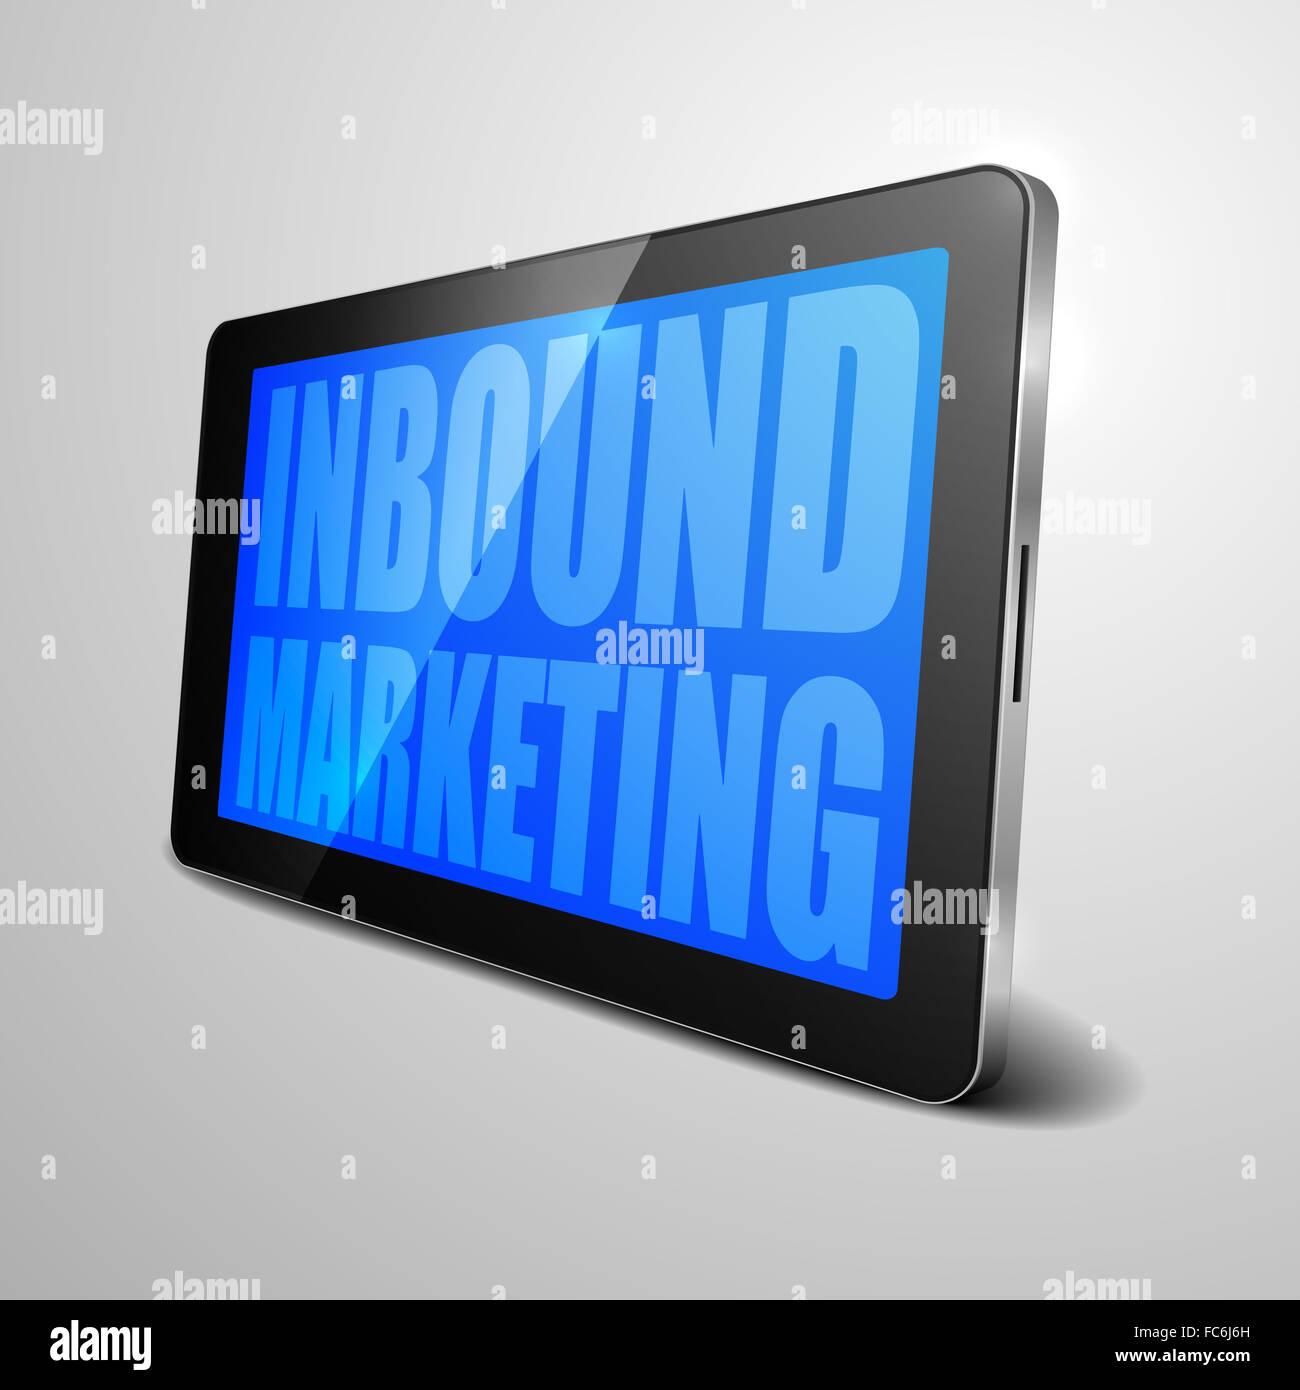 tablet Inbound Marketing - Stock Image